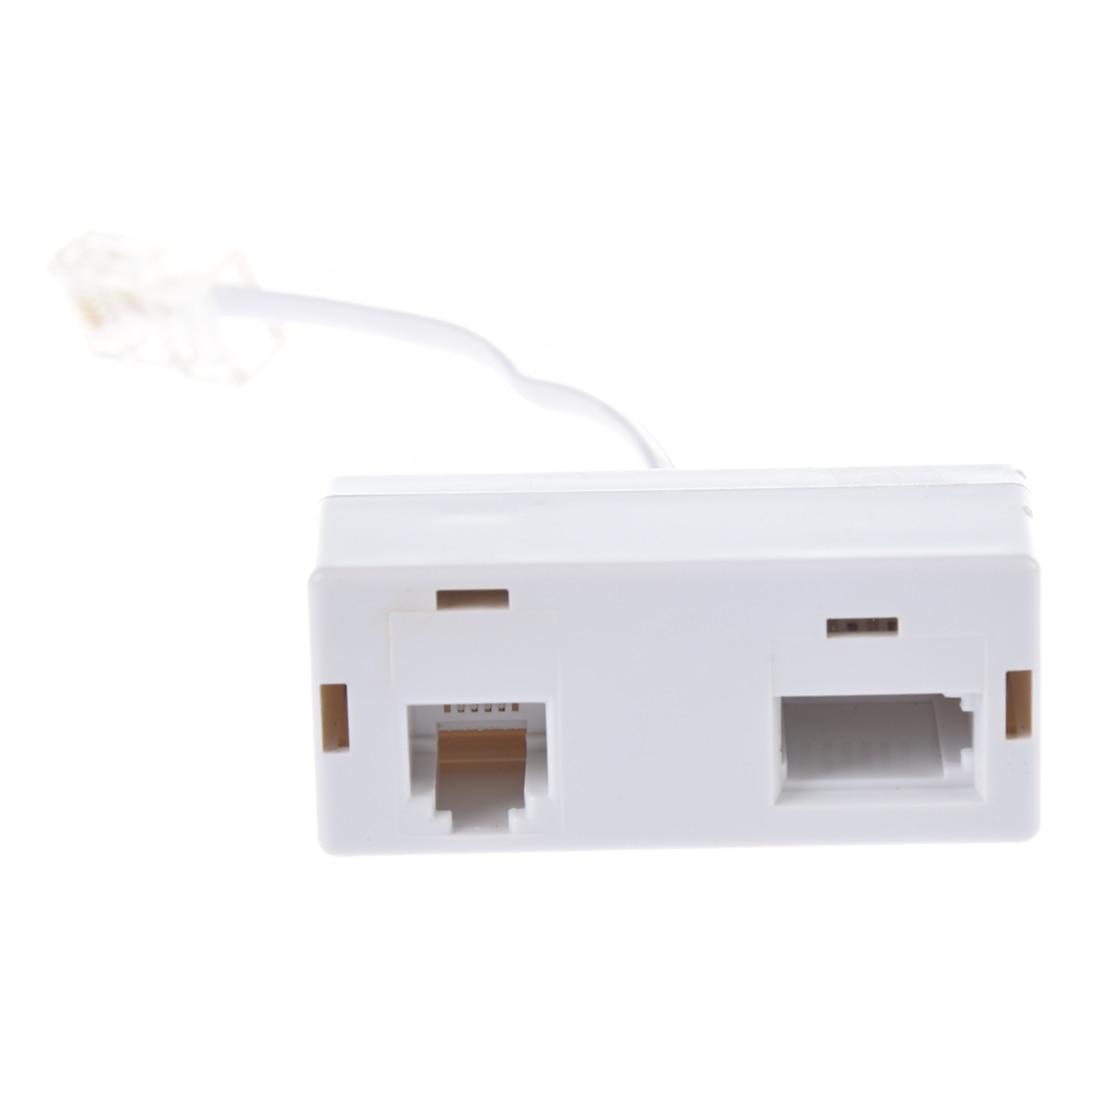 medium resolution of wrg 1822 wiring jack ethernet cat5e lenentonrj45 to bt adapter wiring diagram wire data schema